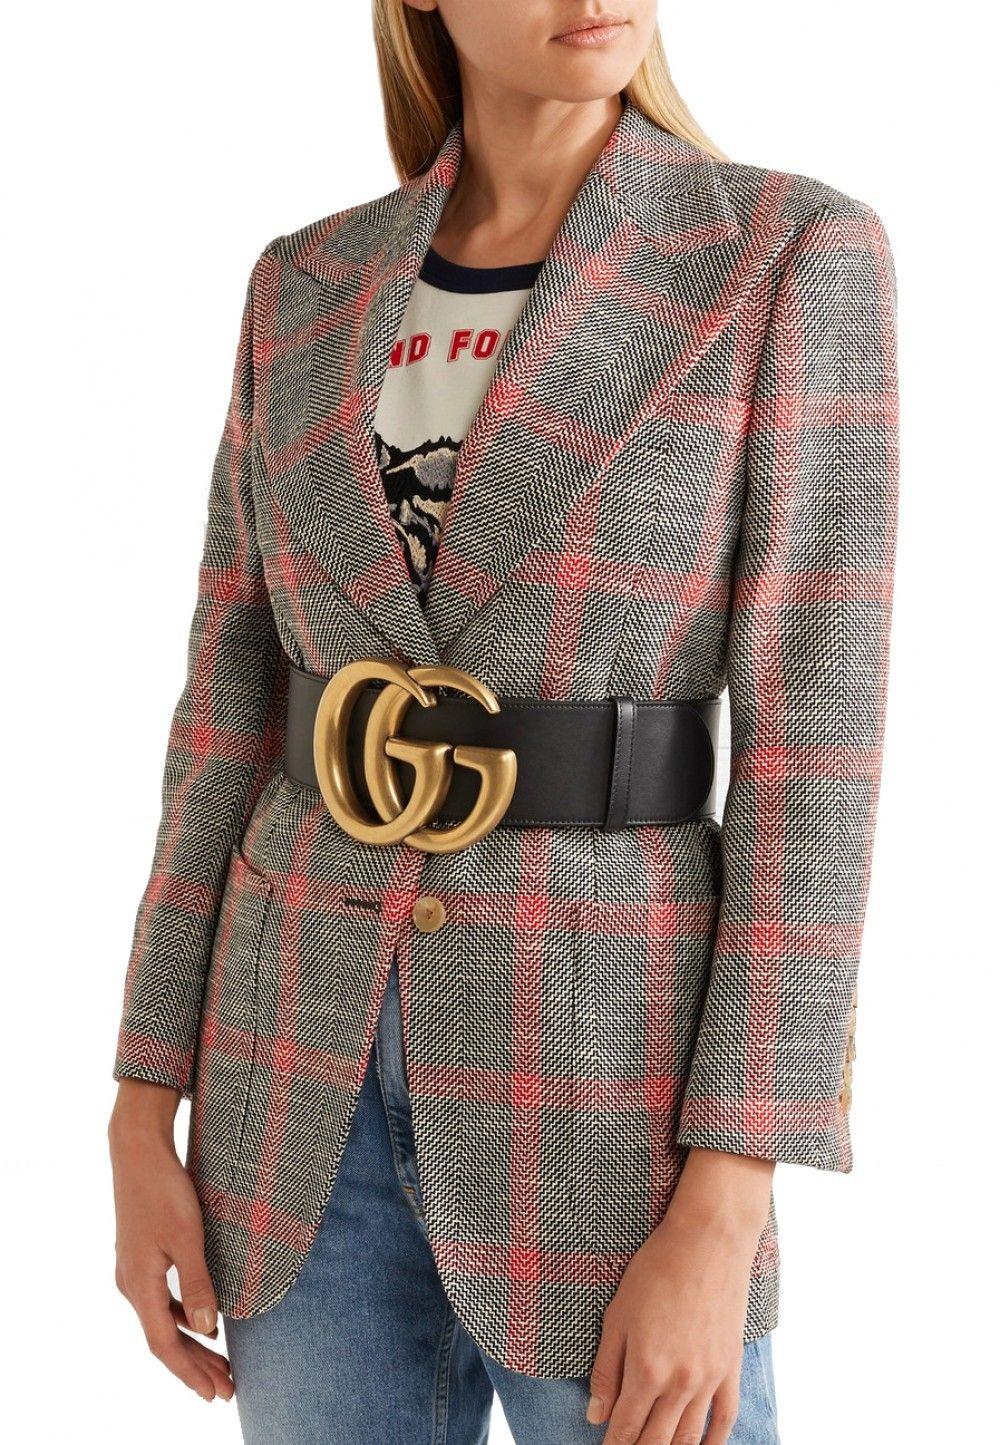 c74bc978c Replica Handbags Gucci Double G 453265 Black Wide leather belt online store